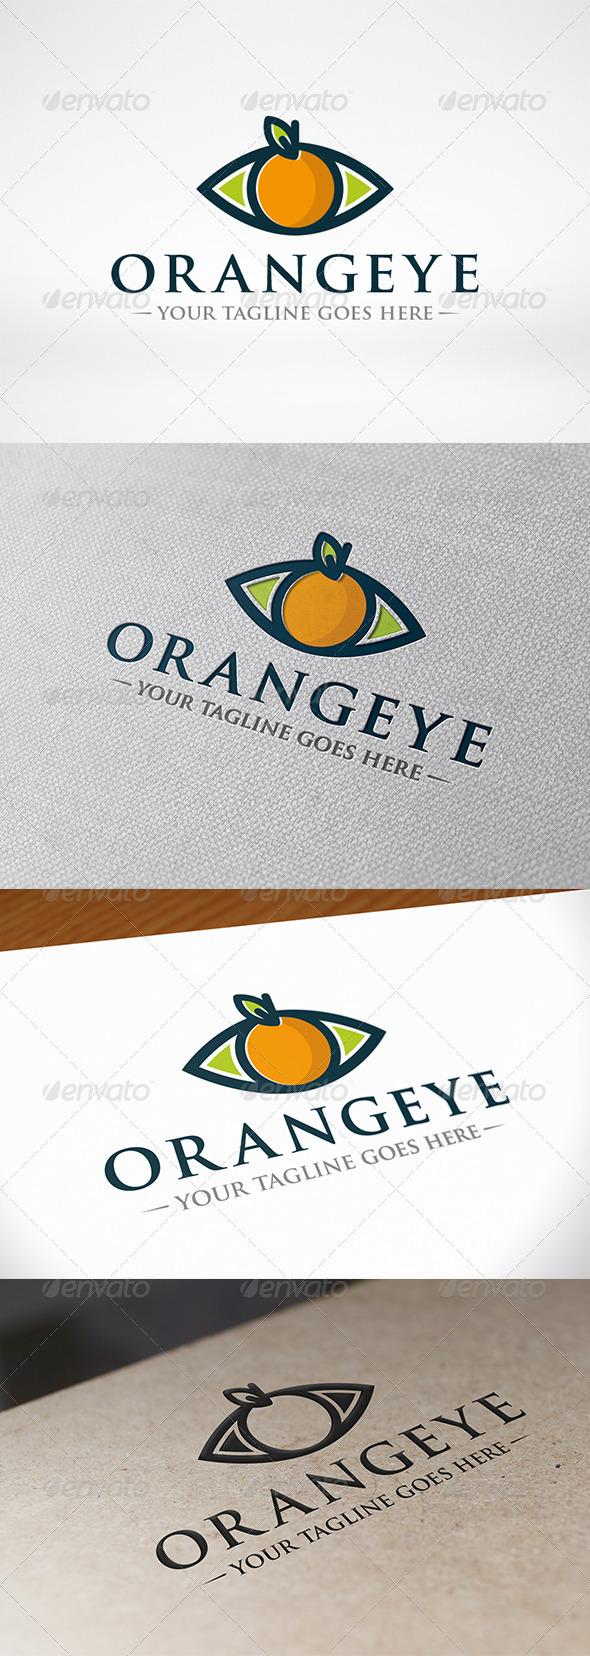 GraphicRiver Orange Eye Logo Template 7050162